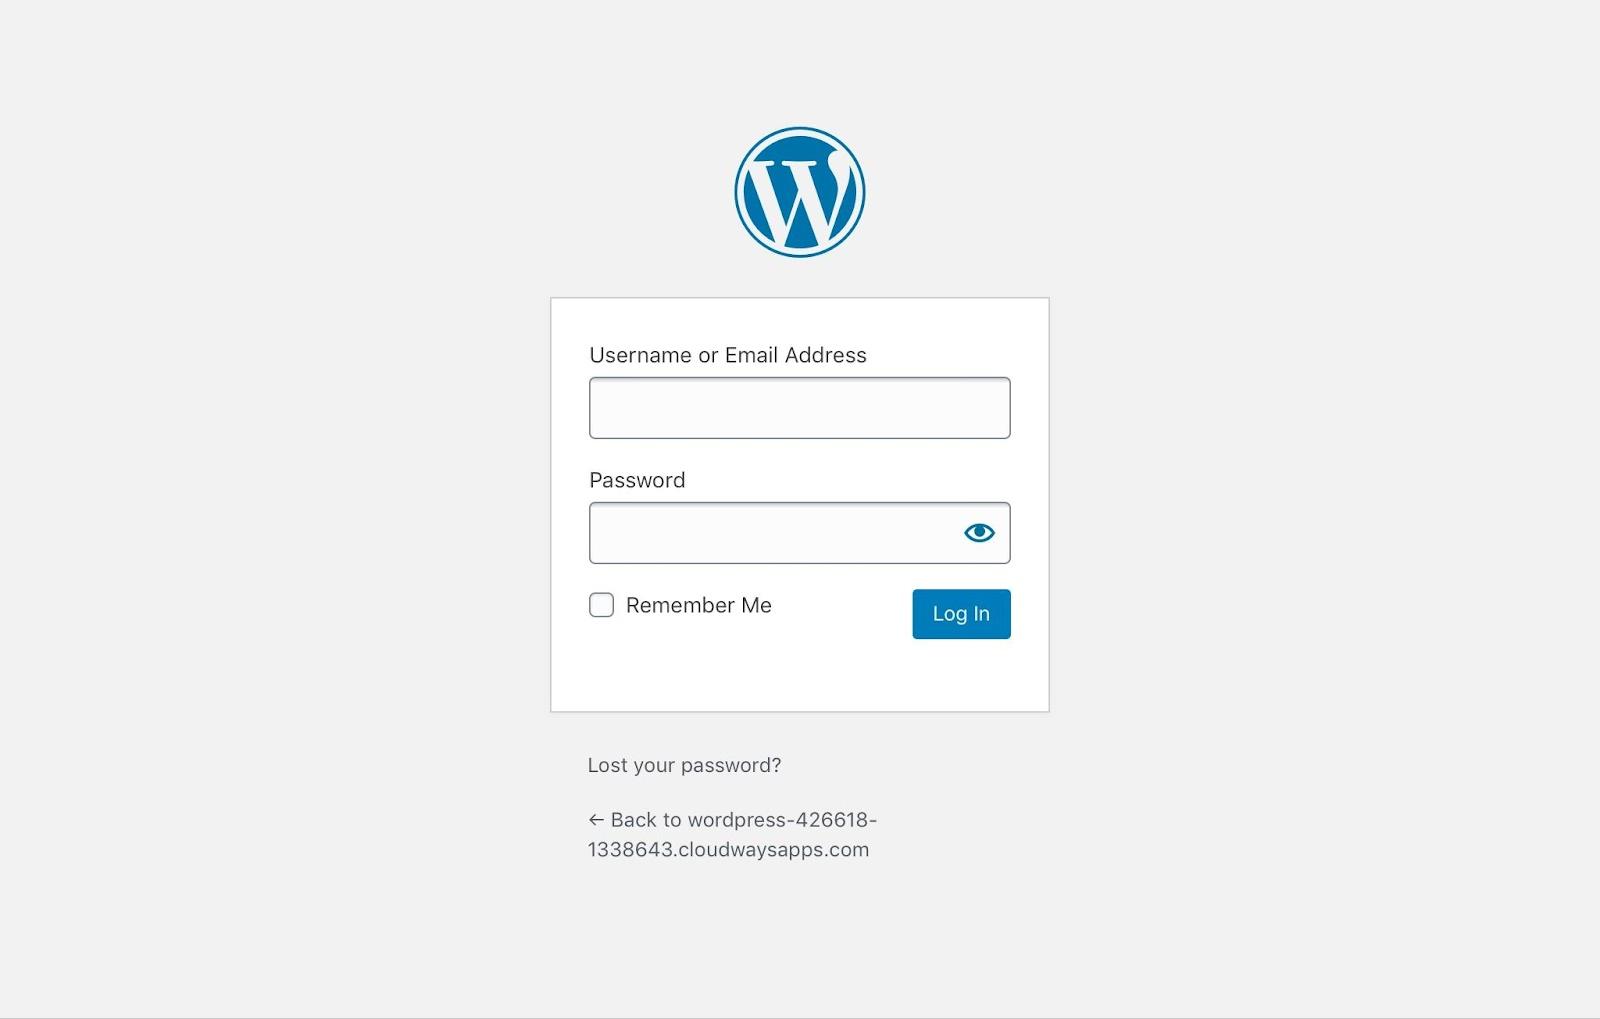 login to your wordpress site